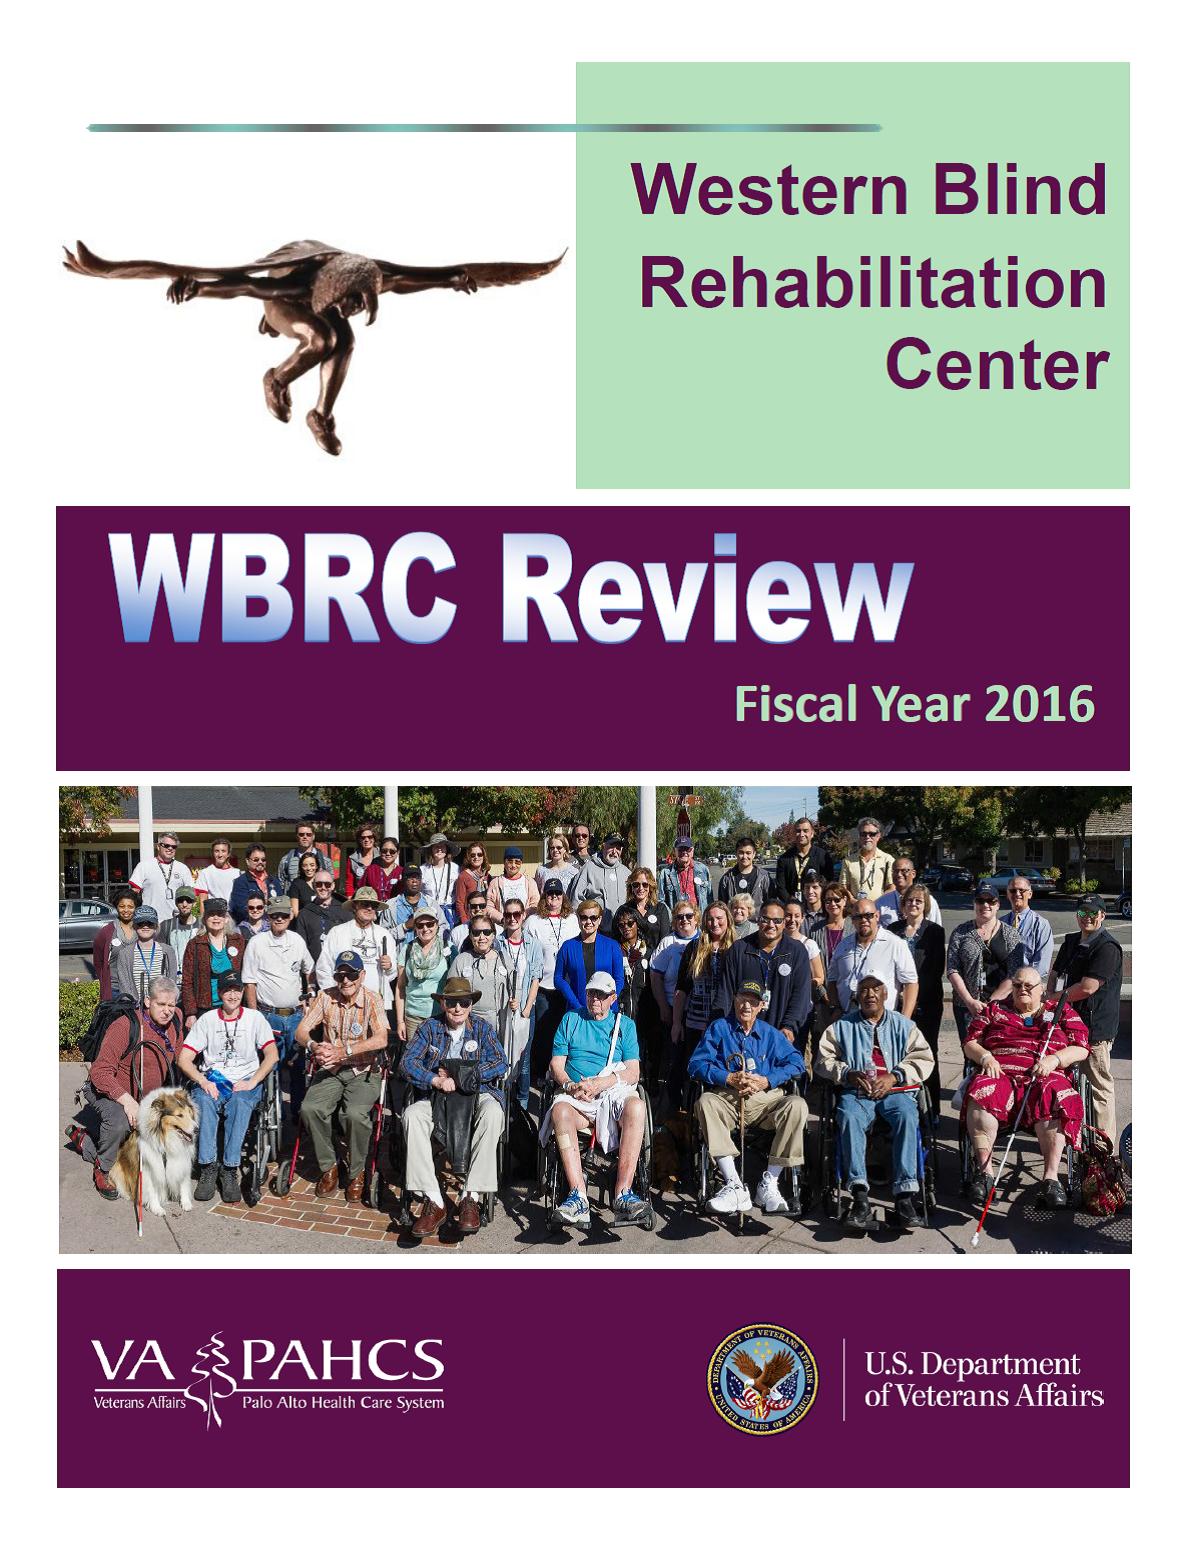 Western Blind Rehabilitation Center: 2017